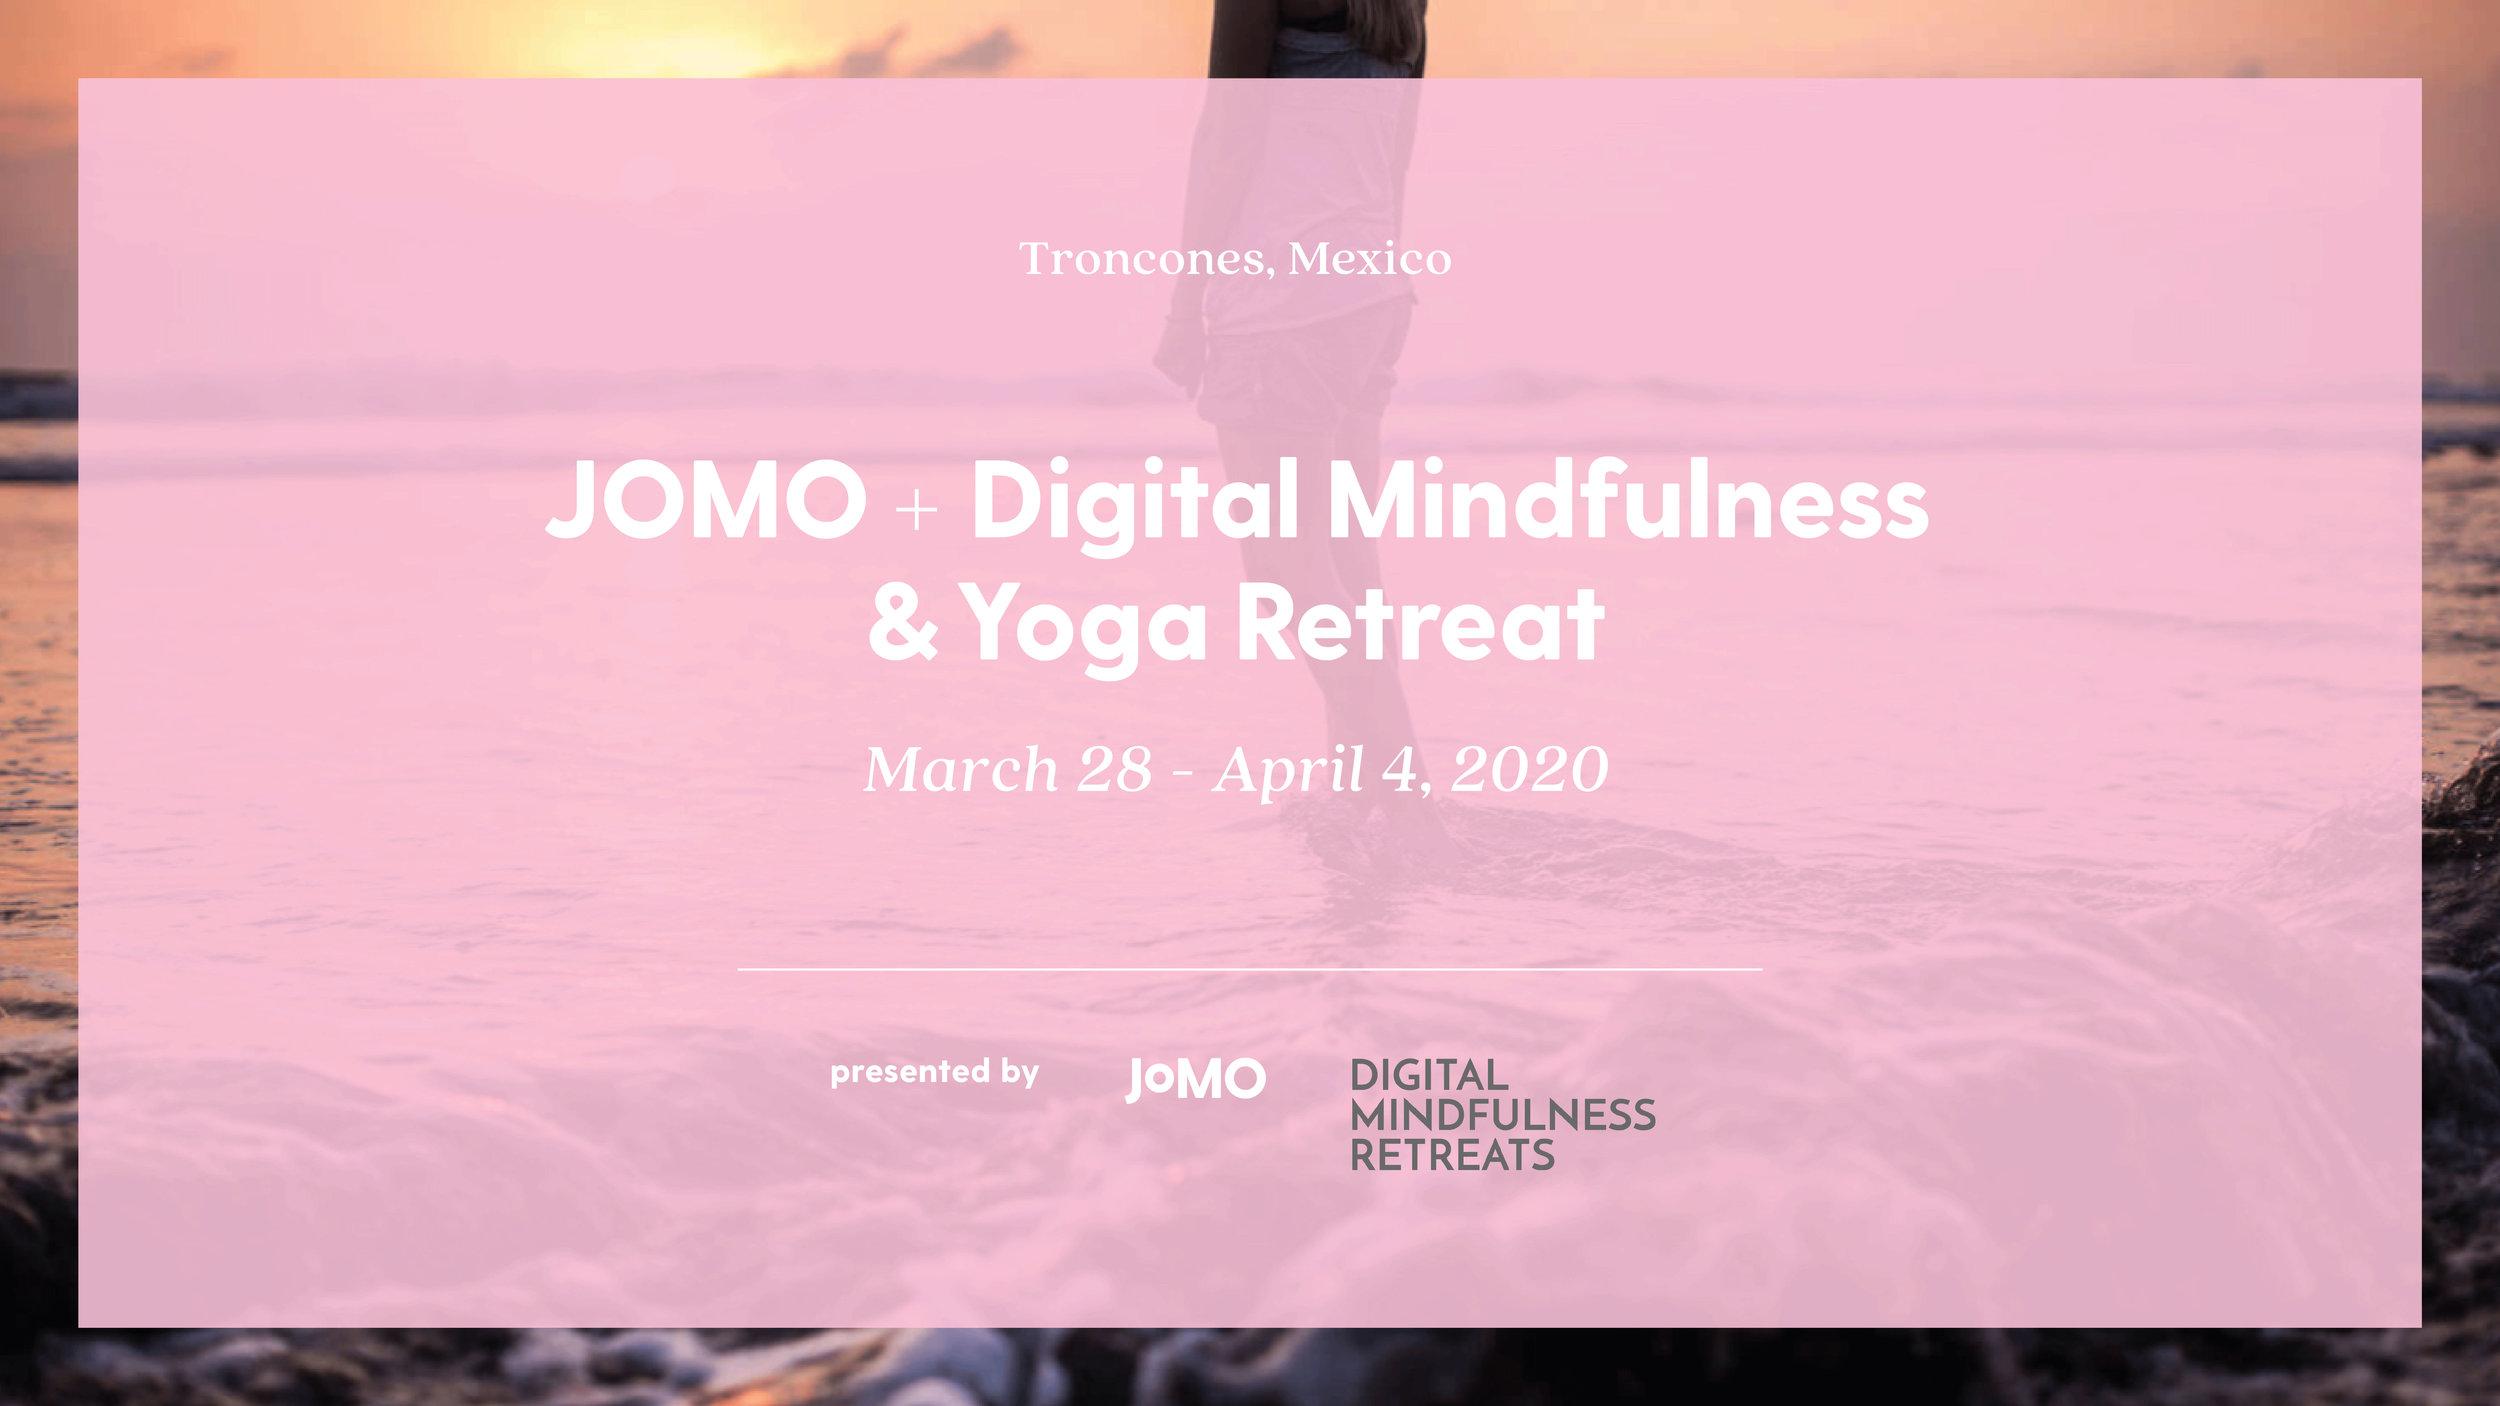 JOMO_TronconesMexJDMRetreat_March2020_Website.jpg